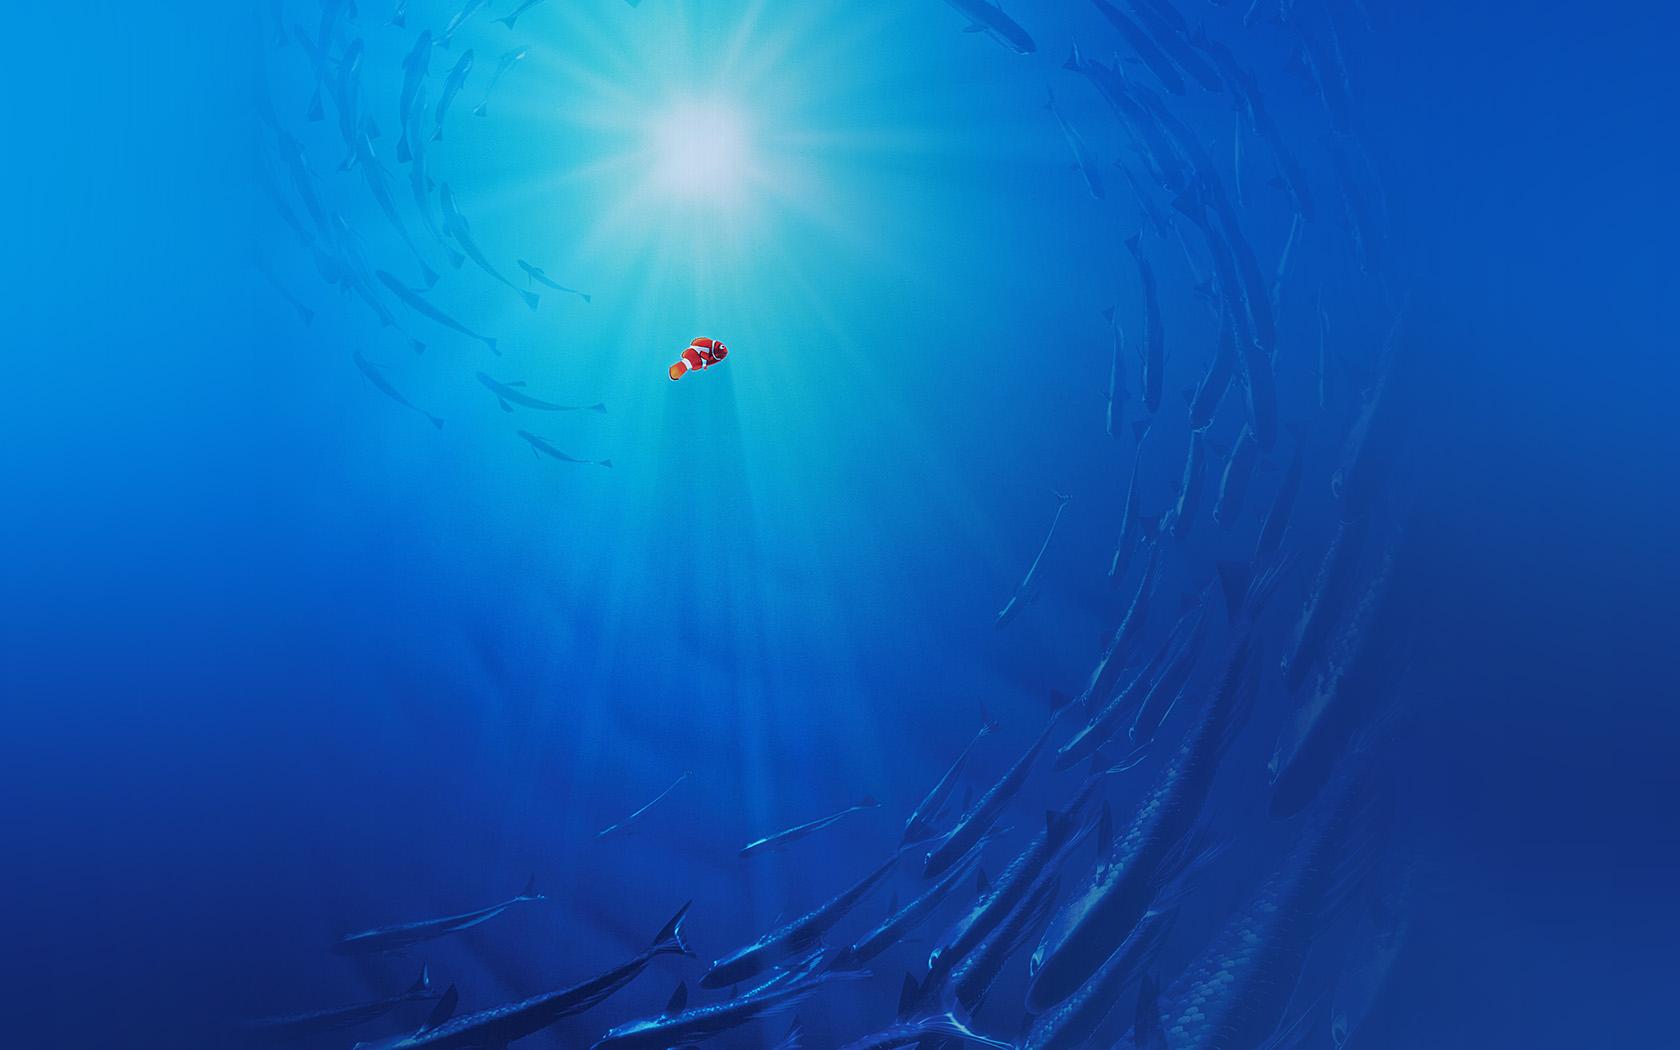 aq58-finding-dory-disney-nemo-cute-wallpaper